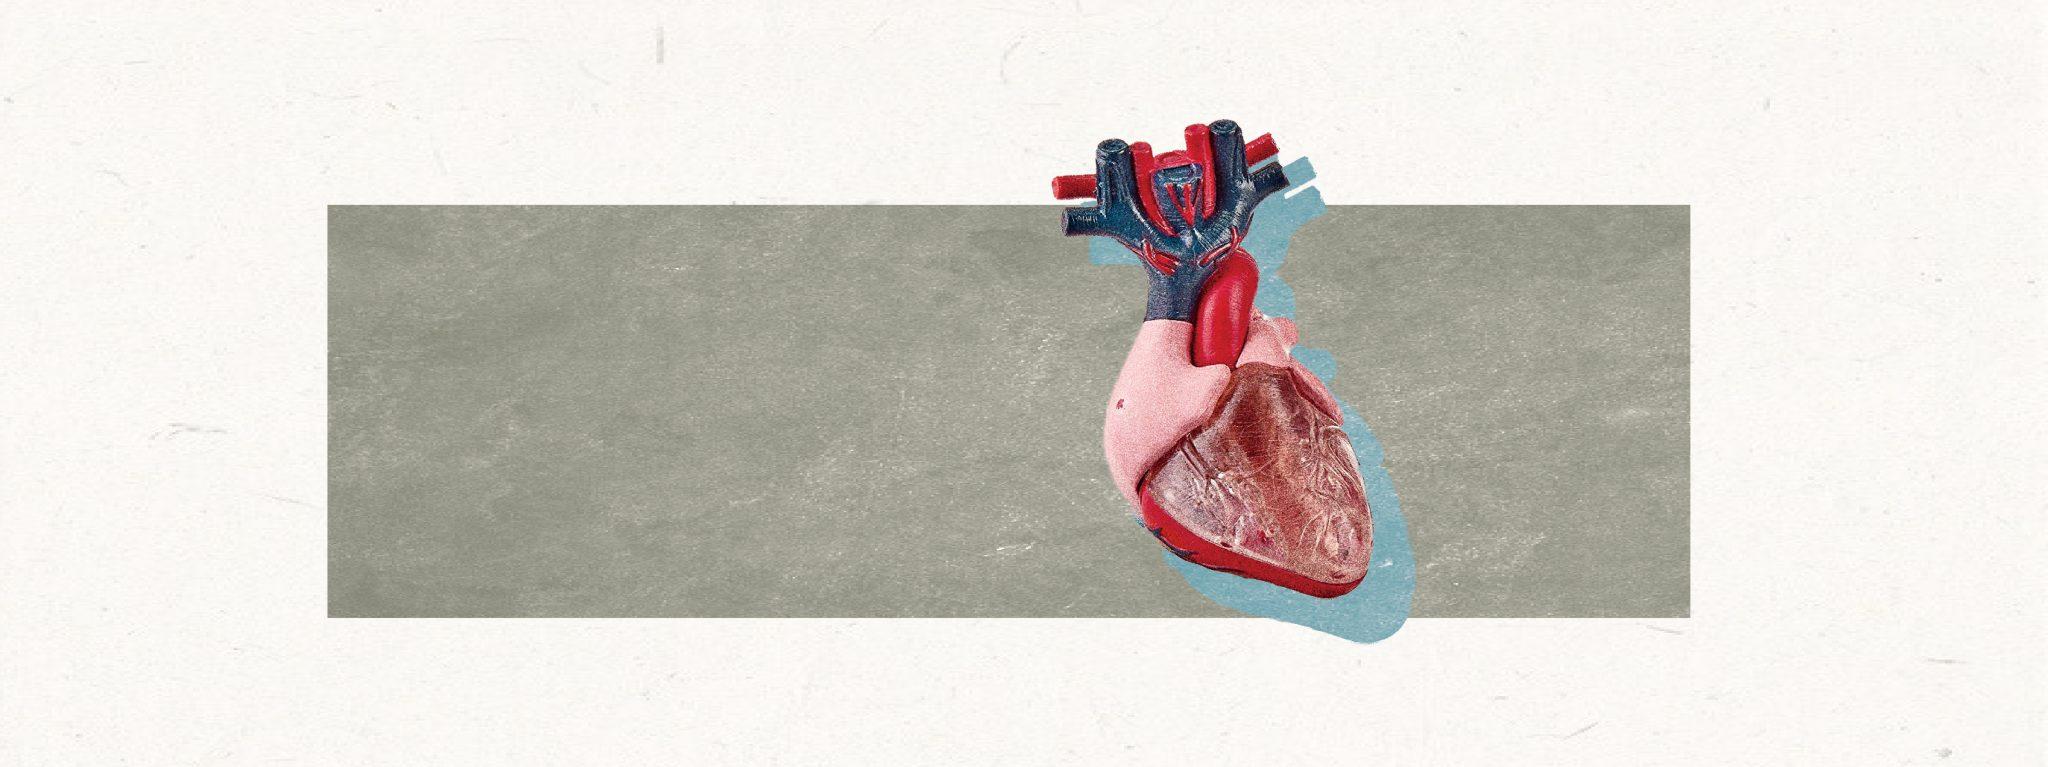 【3D打印連心臟都可以印到?】